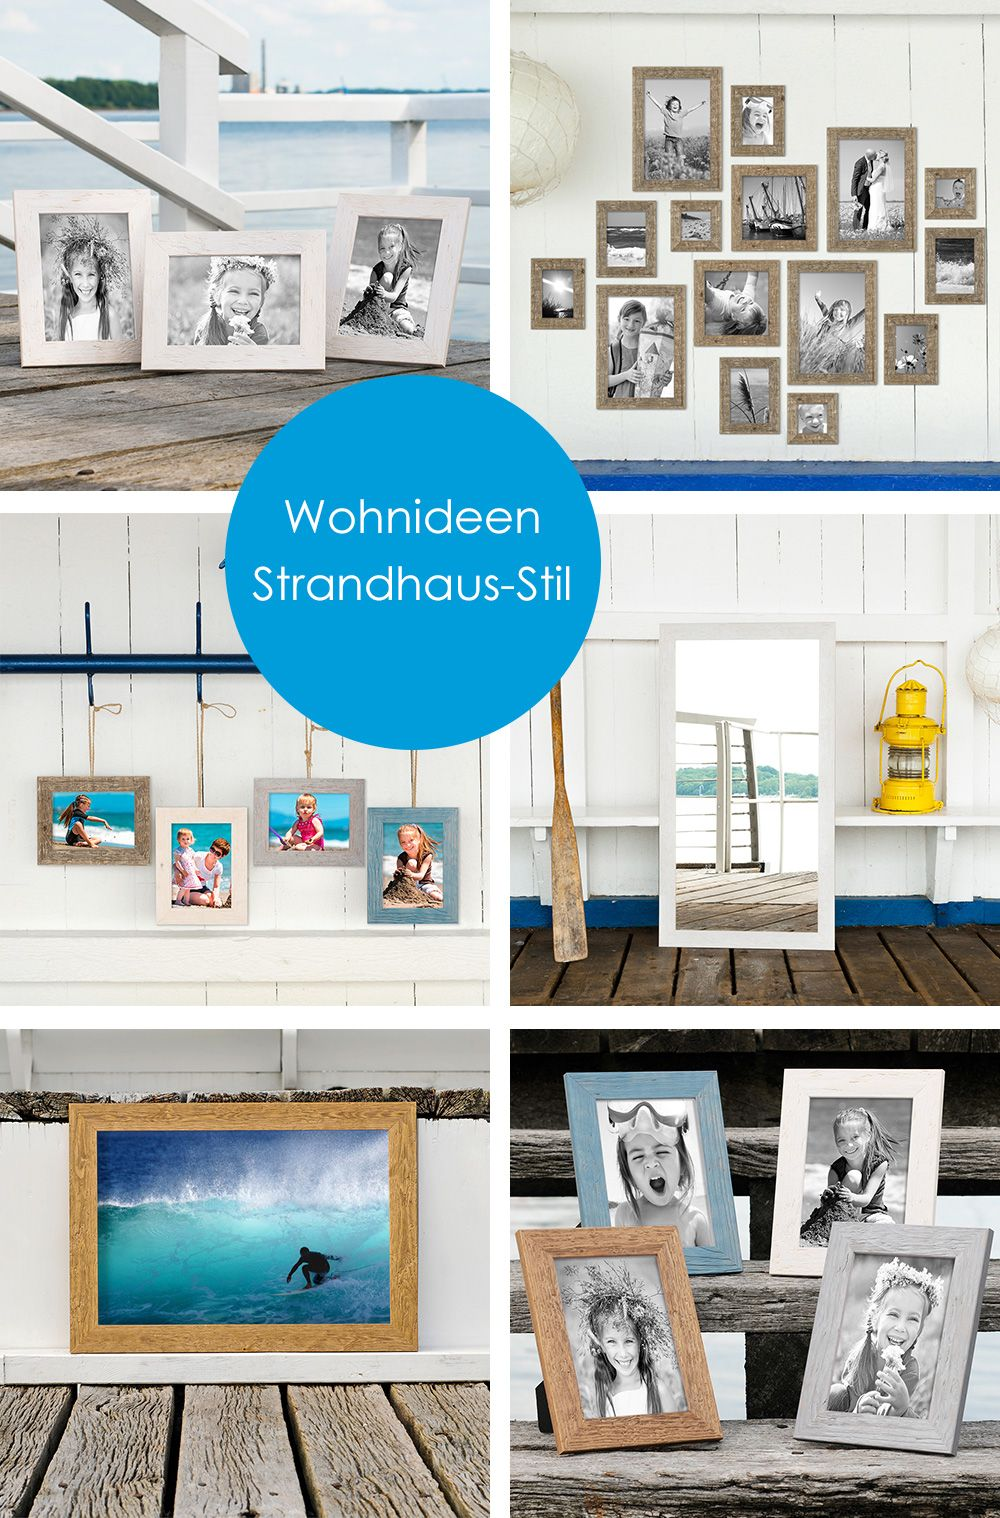 Sechs schöne Wohnideen in Treibholz-Optik. Hol dir den maritimen ...